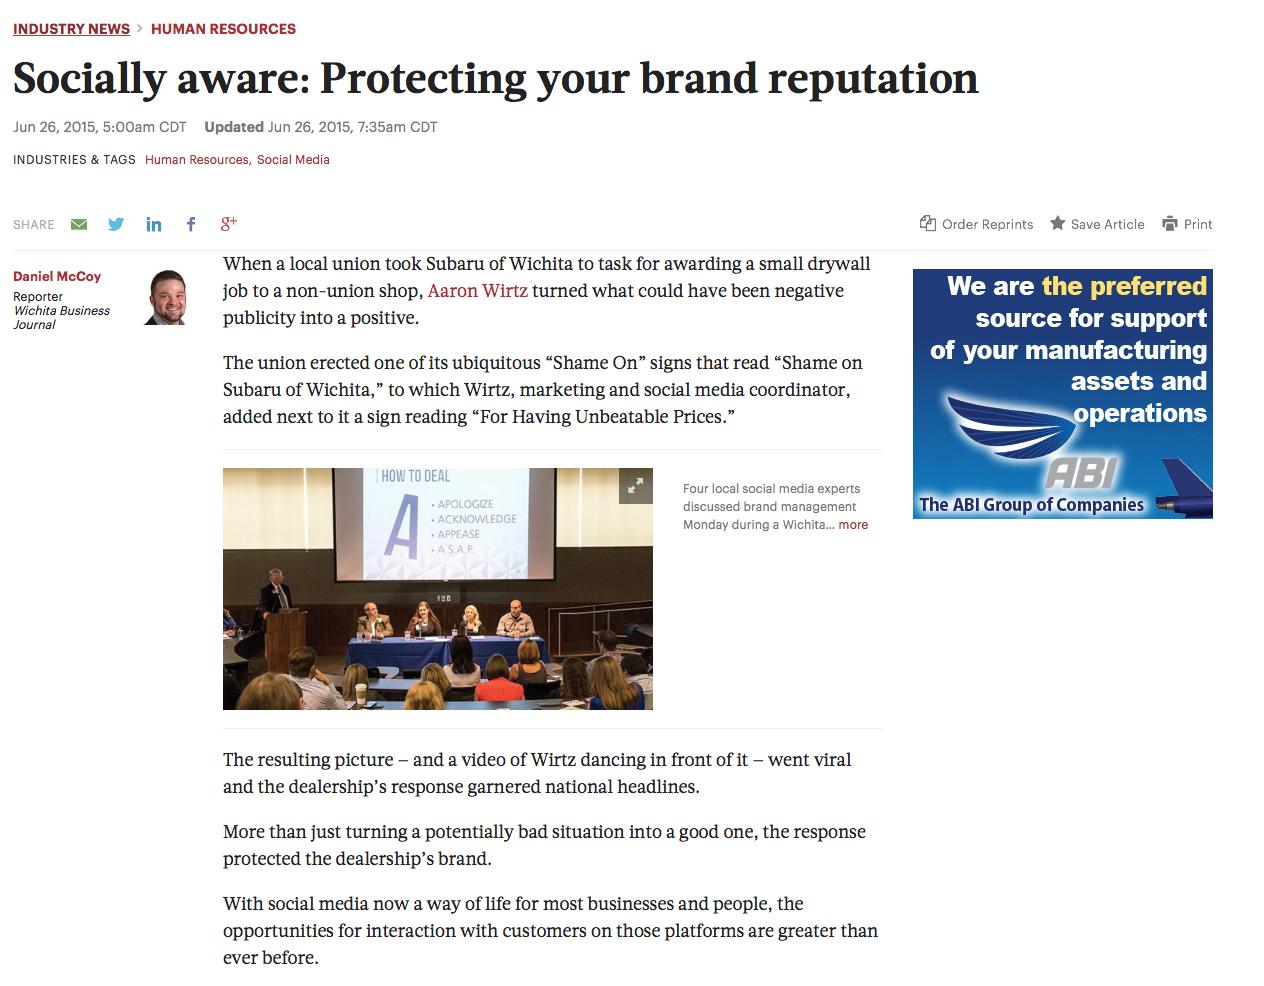 Aaron Wirtz at Wichita Business Journal Discussion